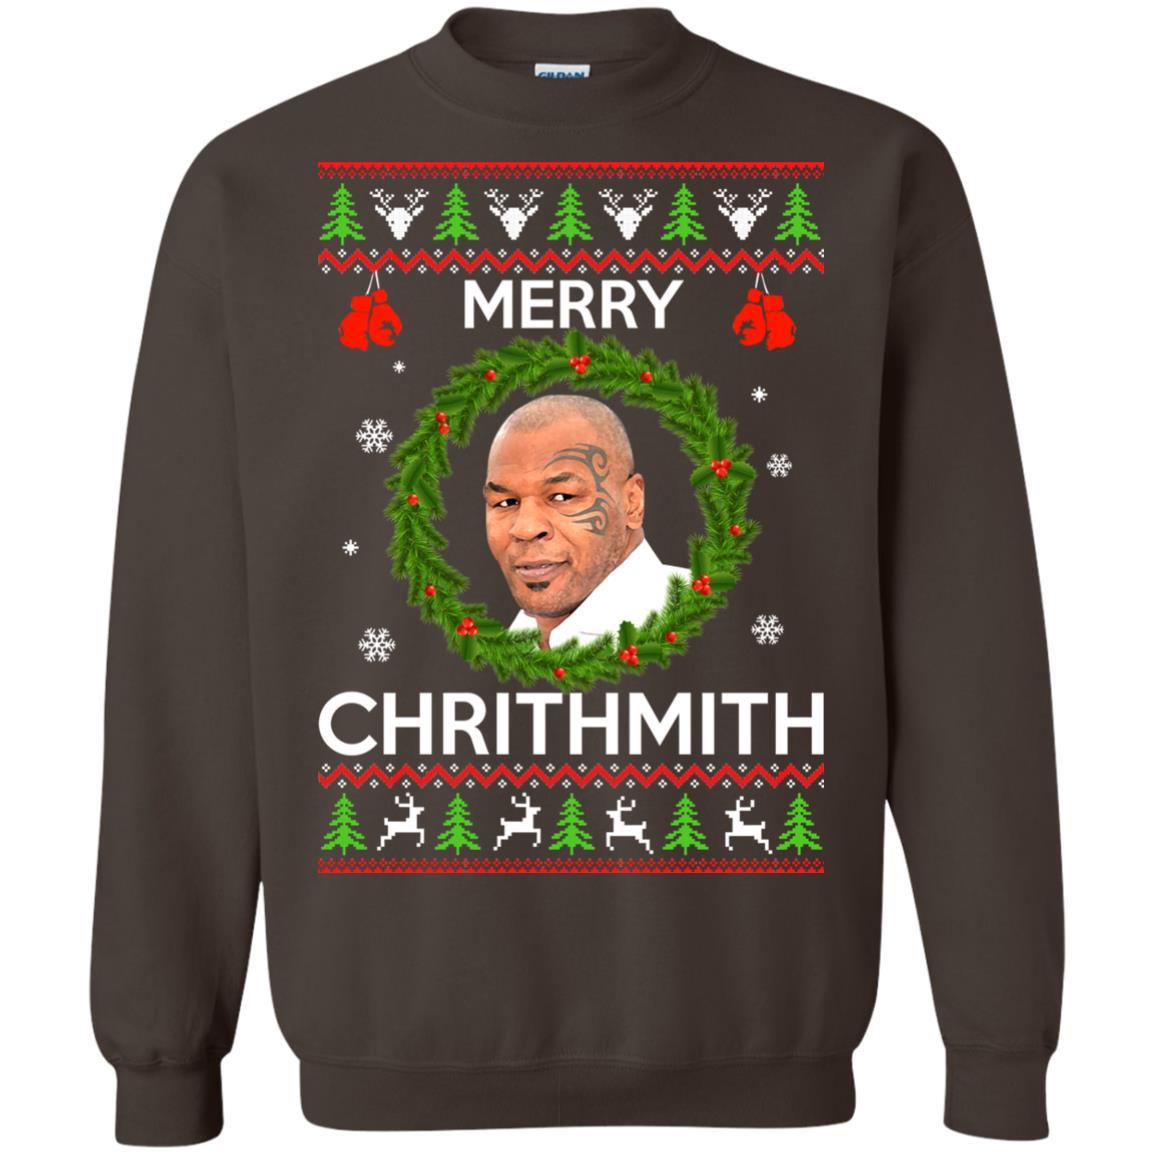 image 846px Mike Tyson Christmas Sweater Merry Chrithmith Sweatshirt